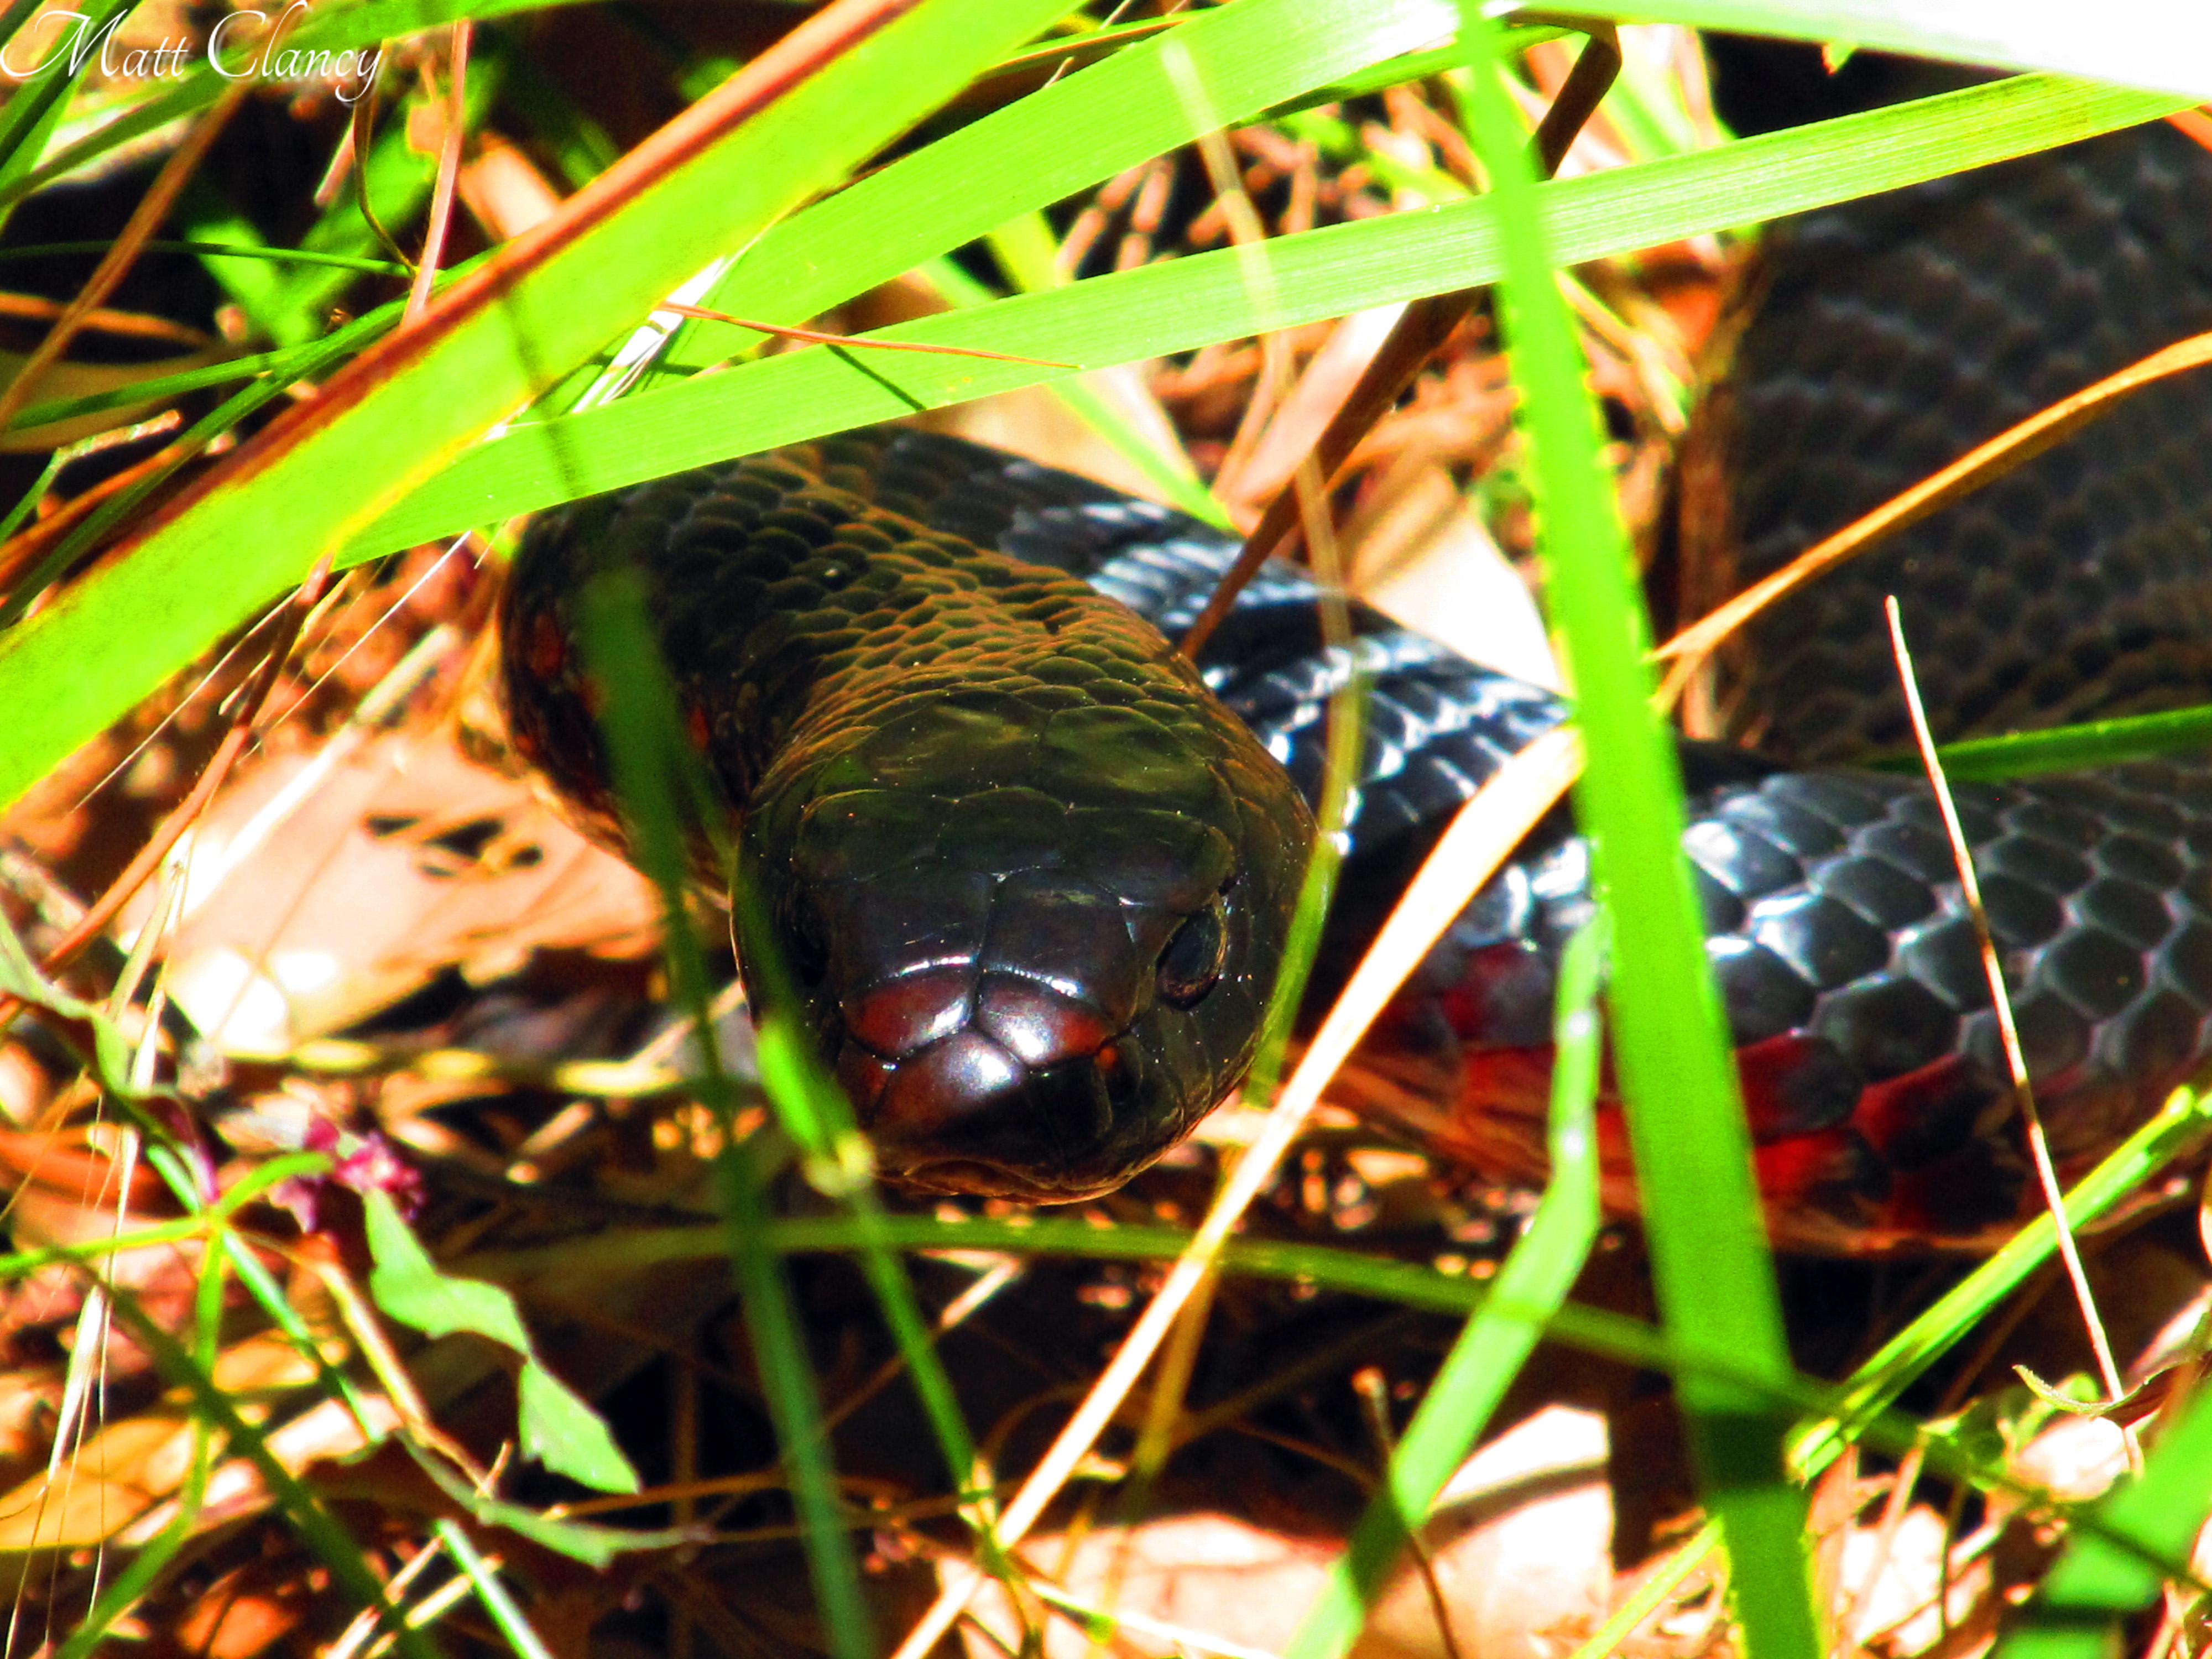 Red-bellied Black Snake svg #1, Download drawings